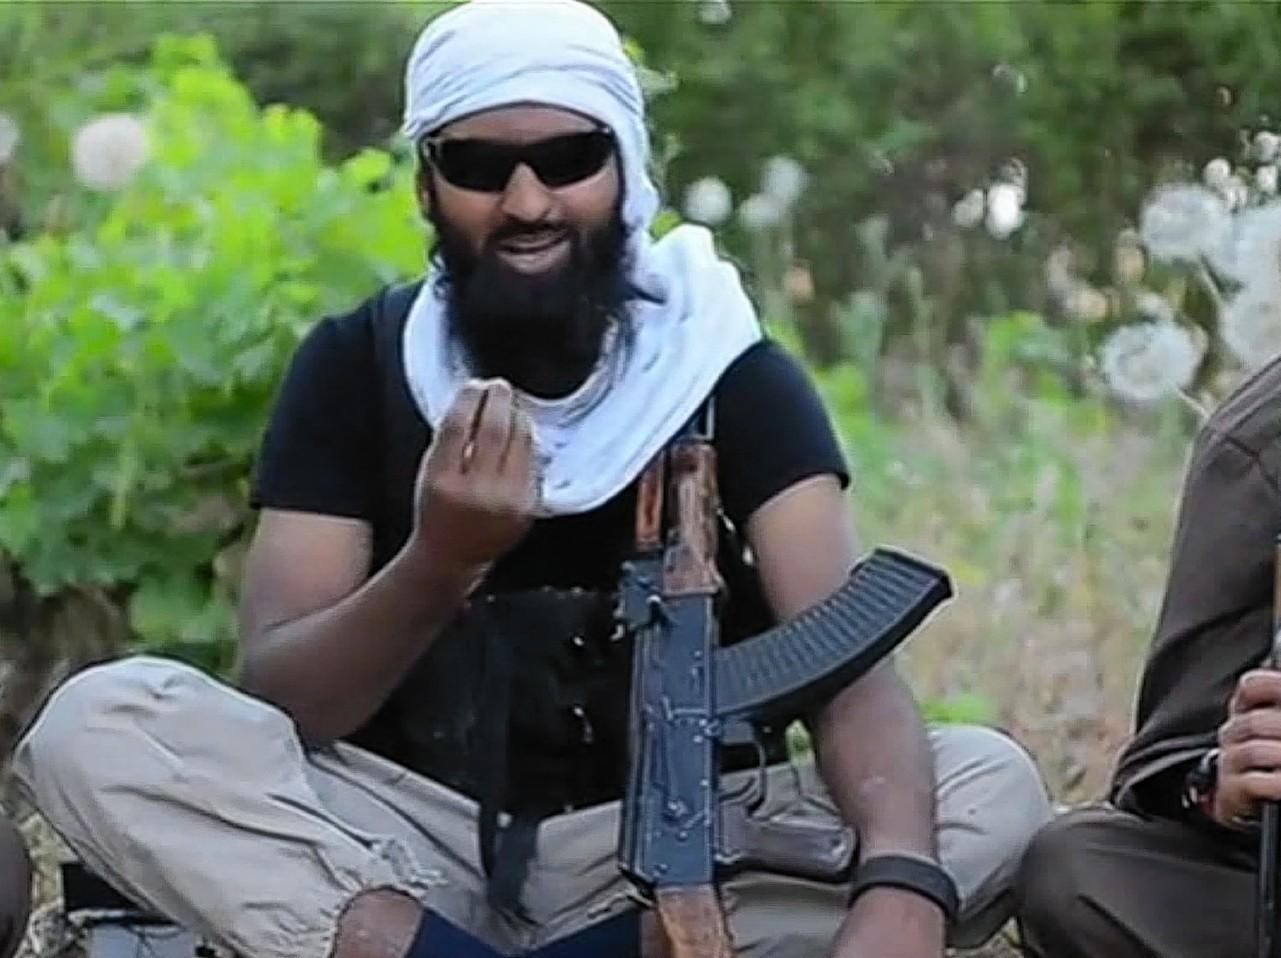 Abdul Rakib Amin, the north-east man who fled to join ISIS